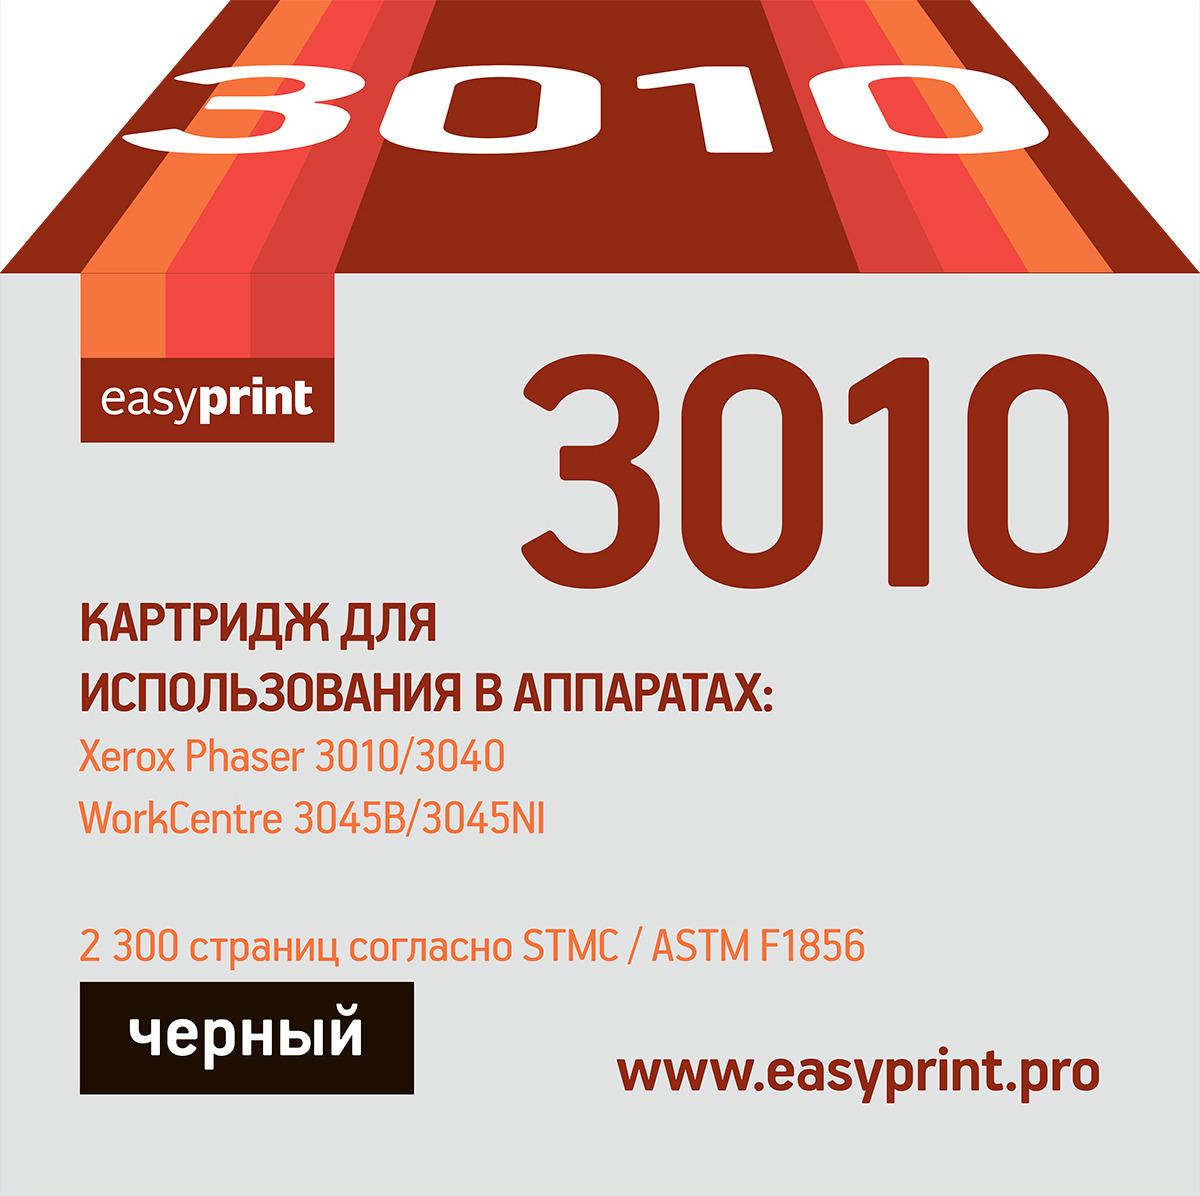 Тонер-картридж EasyPrint LX-3010 для Xerox Phaser 3010/3040/WorkCentre 3045, 2300 страниц, с чипом, black